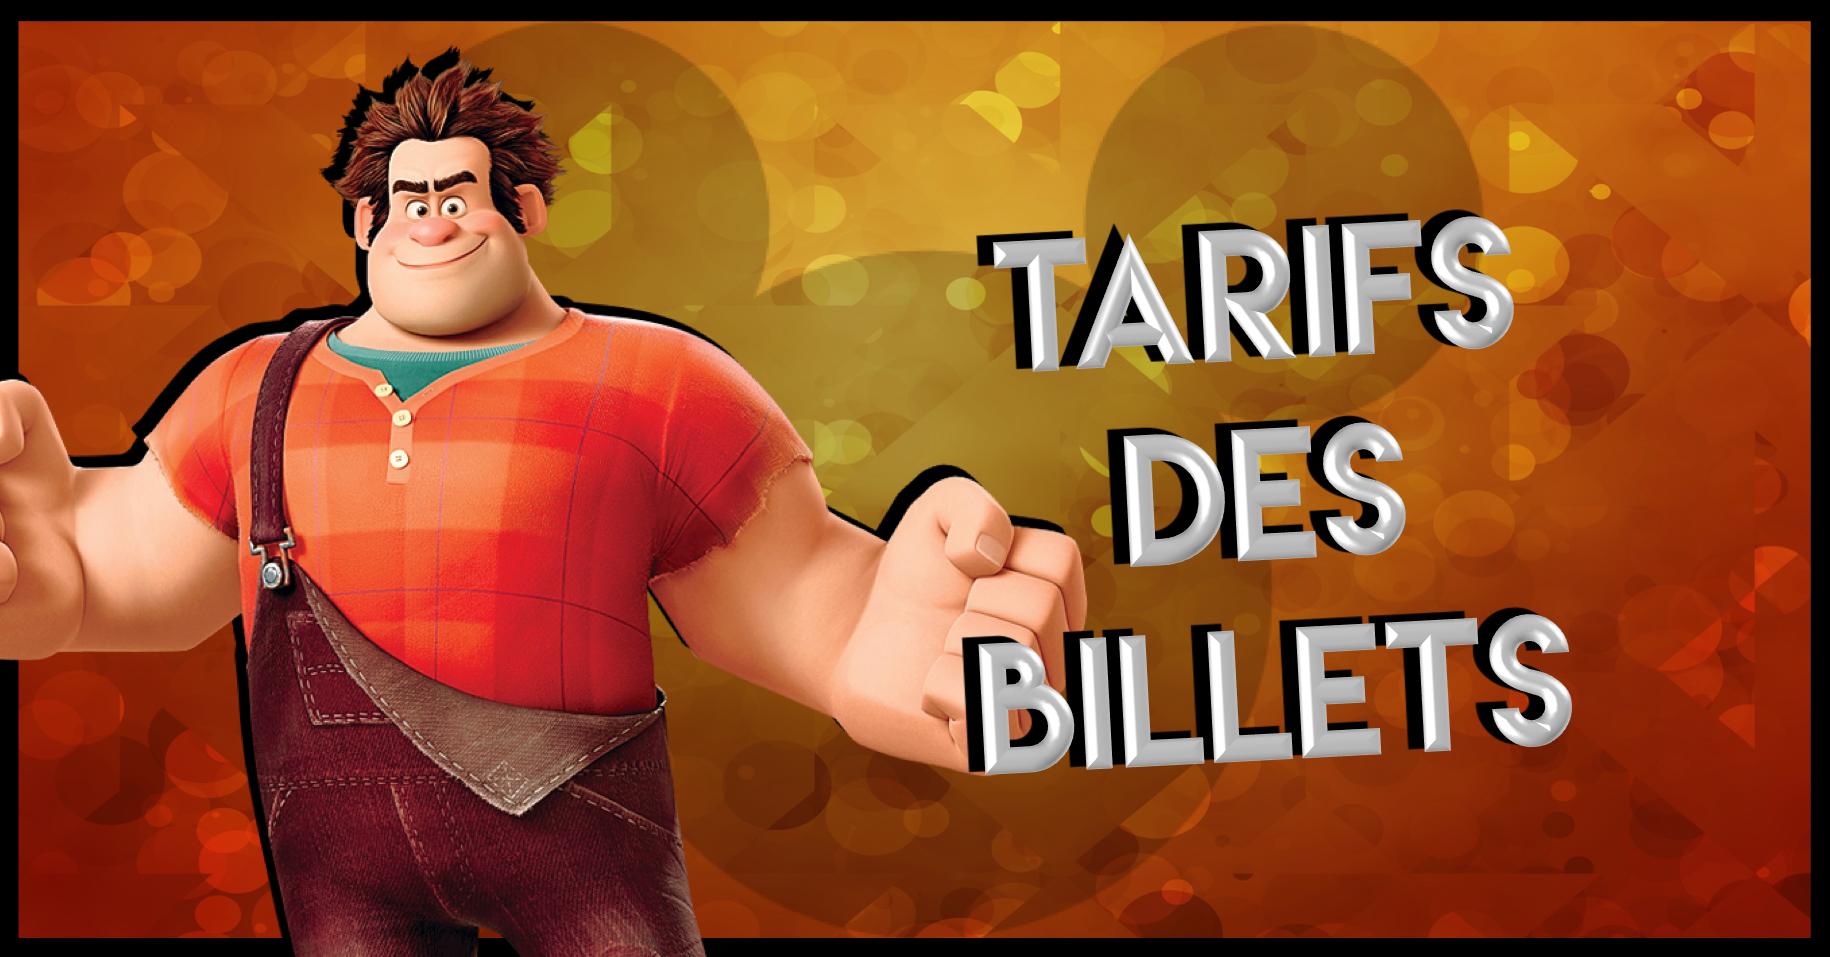 TARIFSBILLETS.png